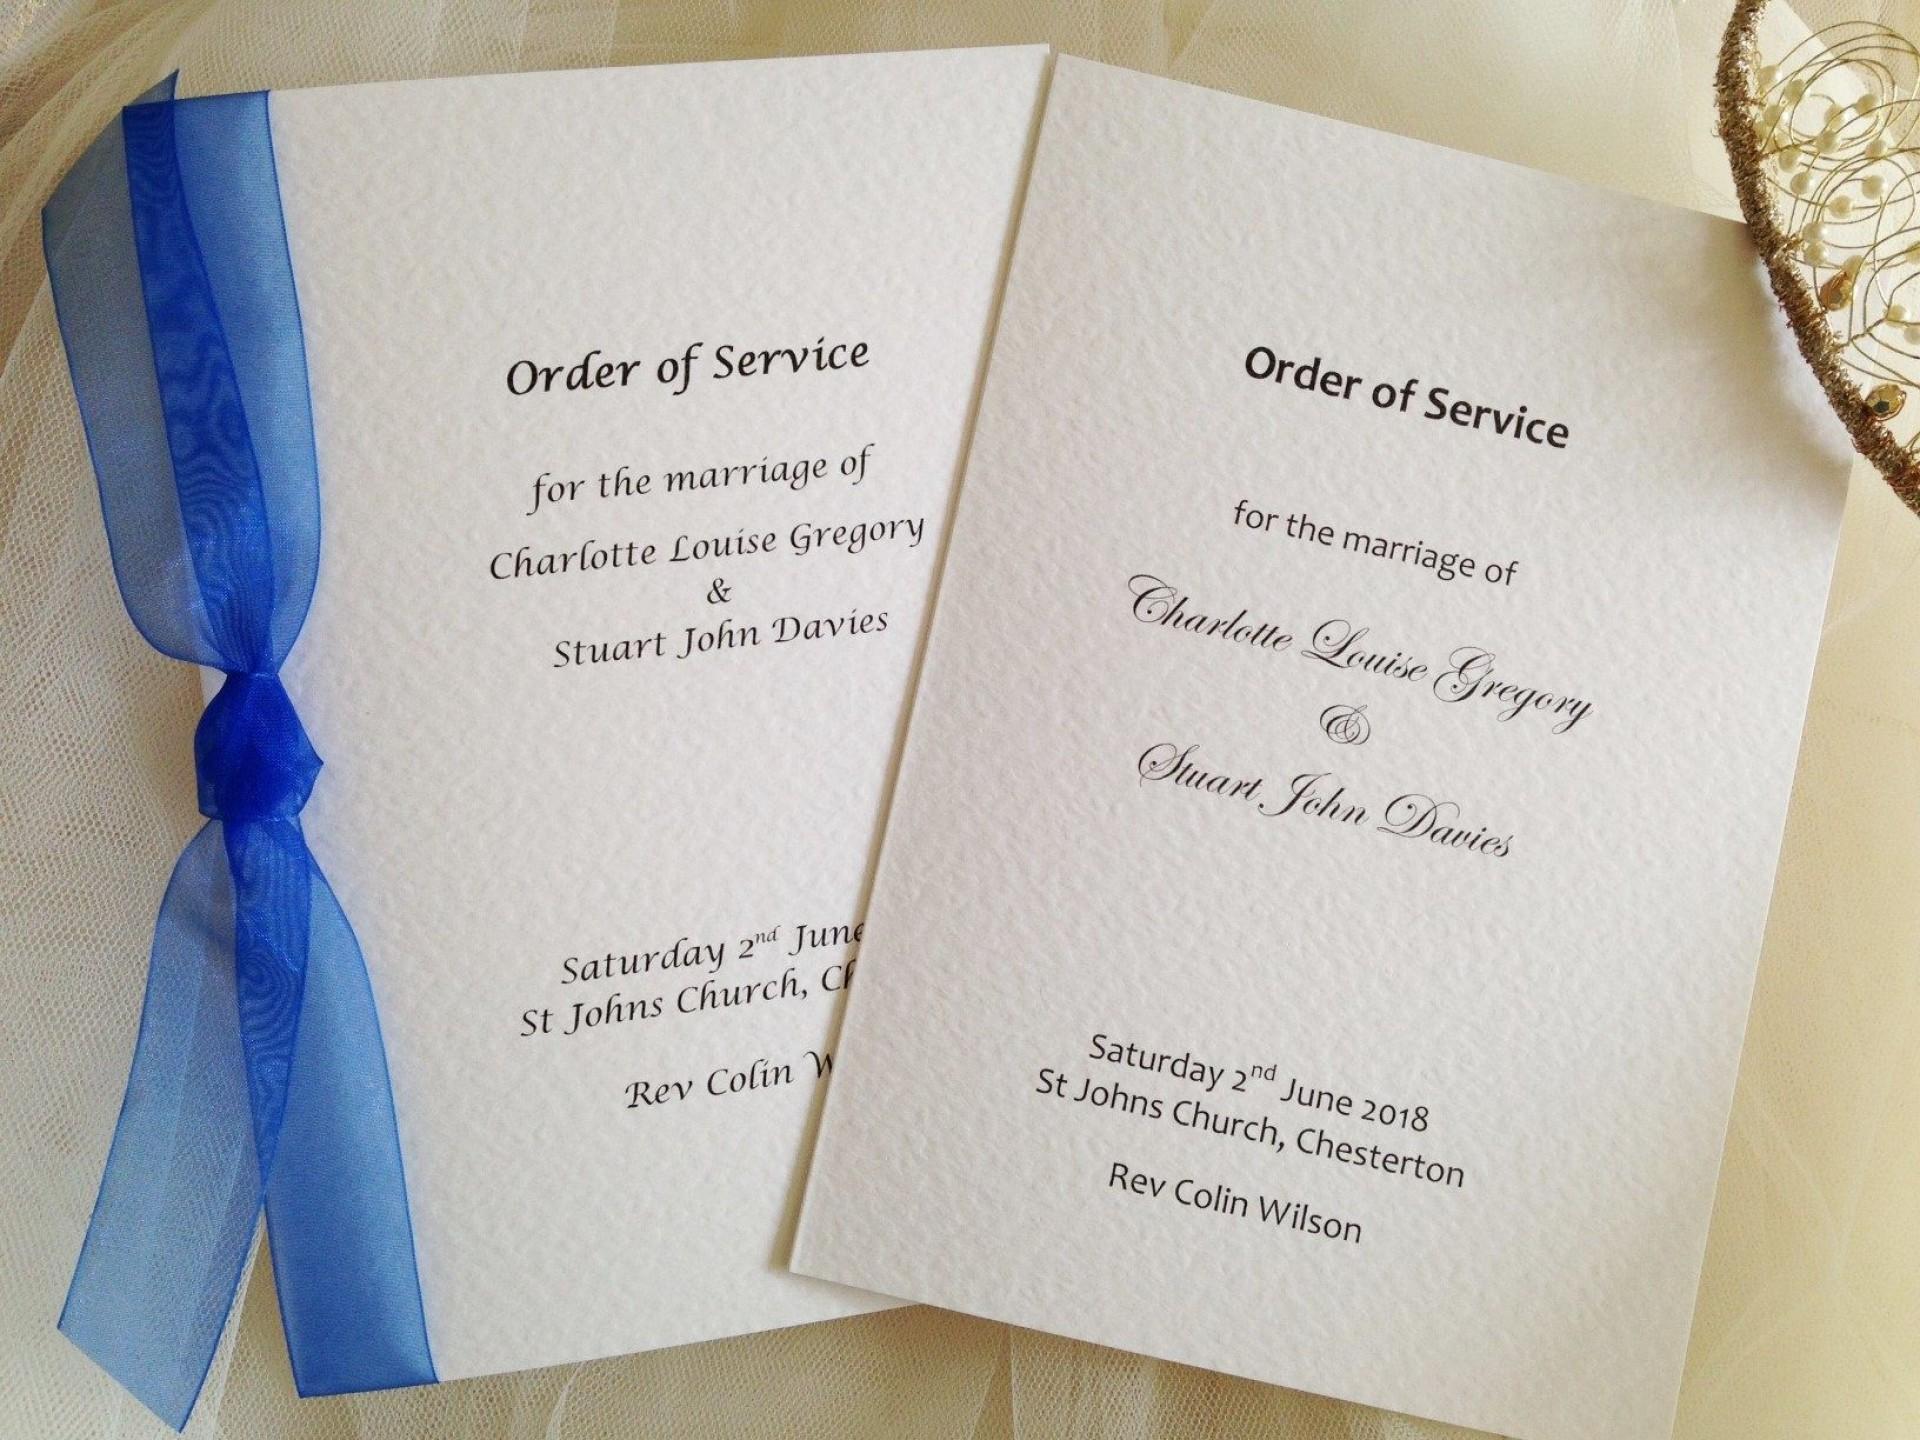 005 Striking Church Wedding Order Of Service Template Uk Highest Quality 1920